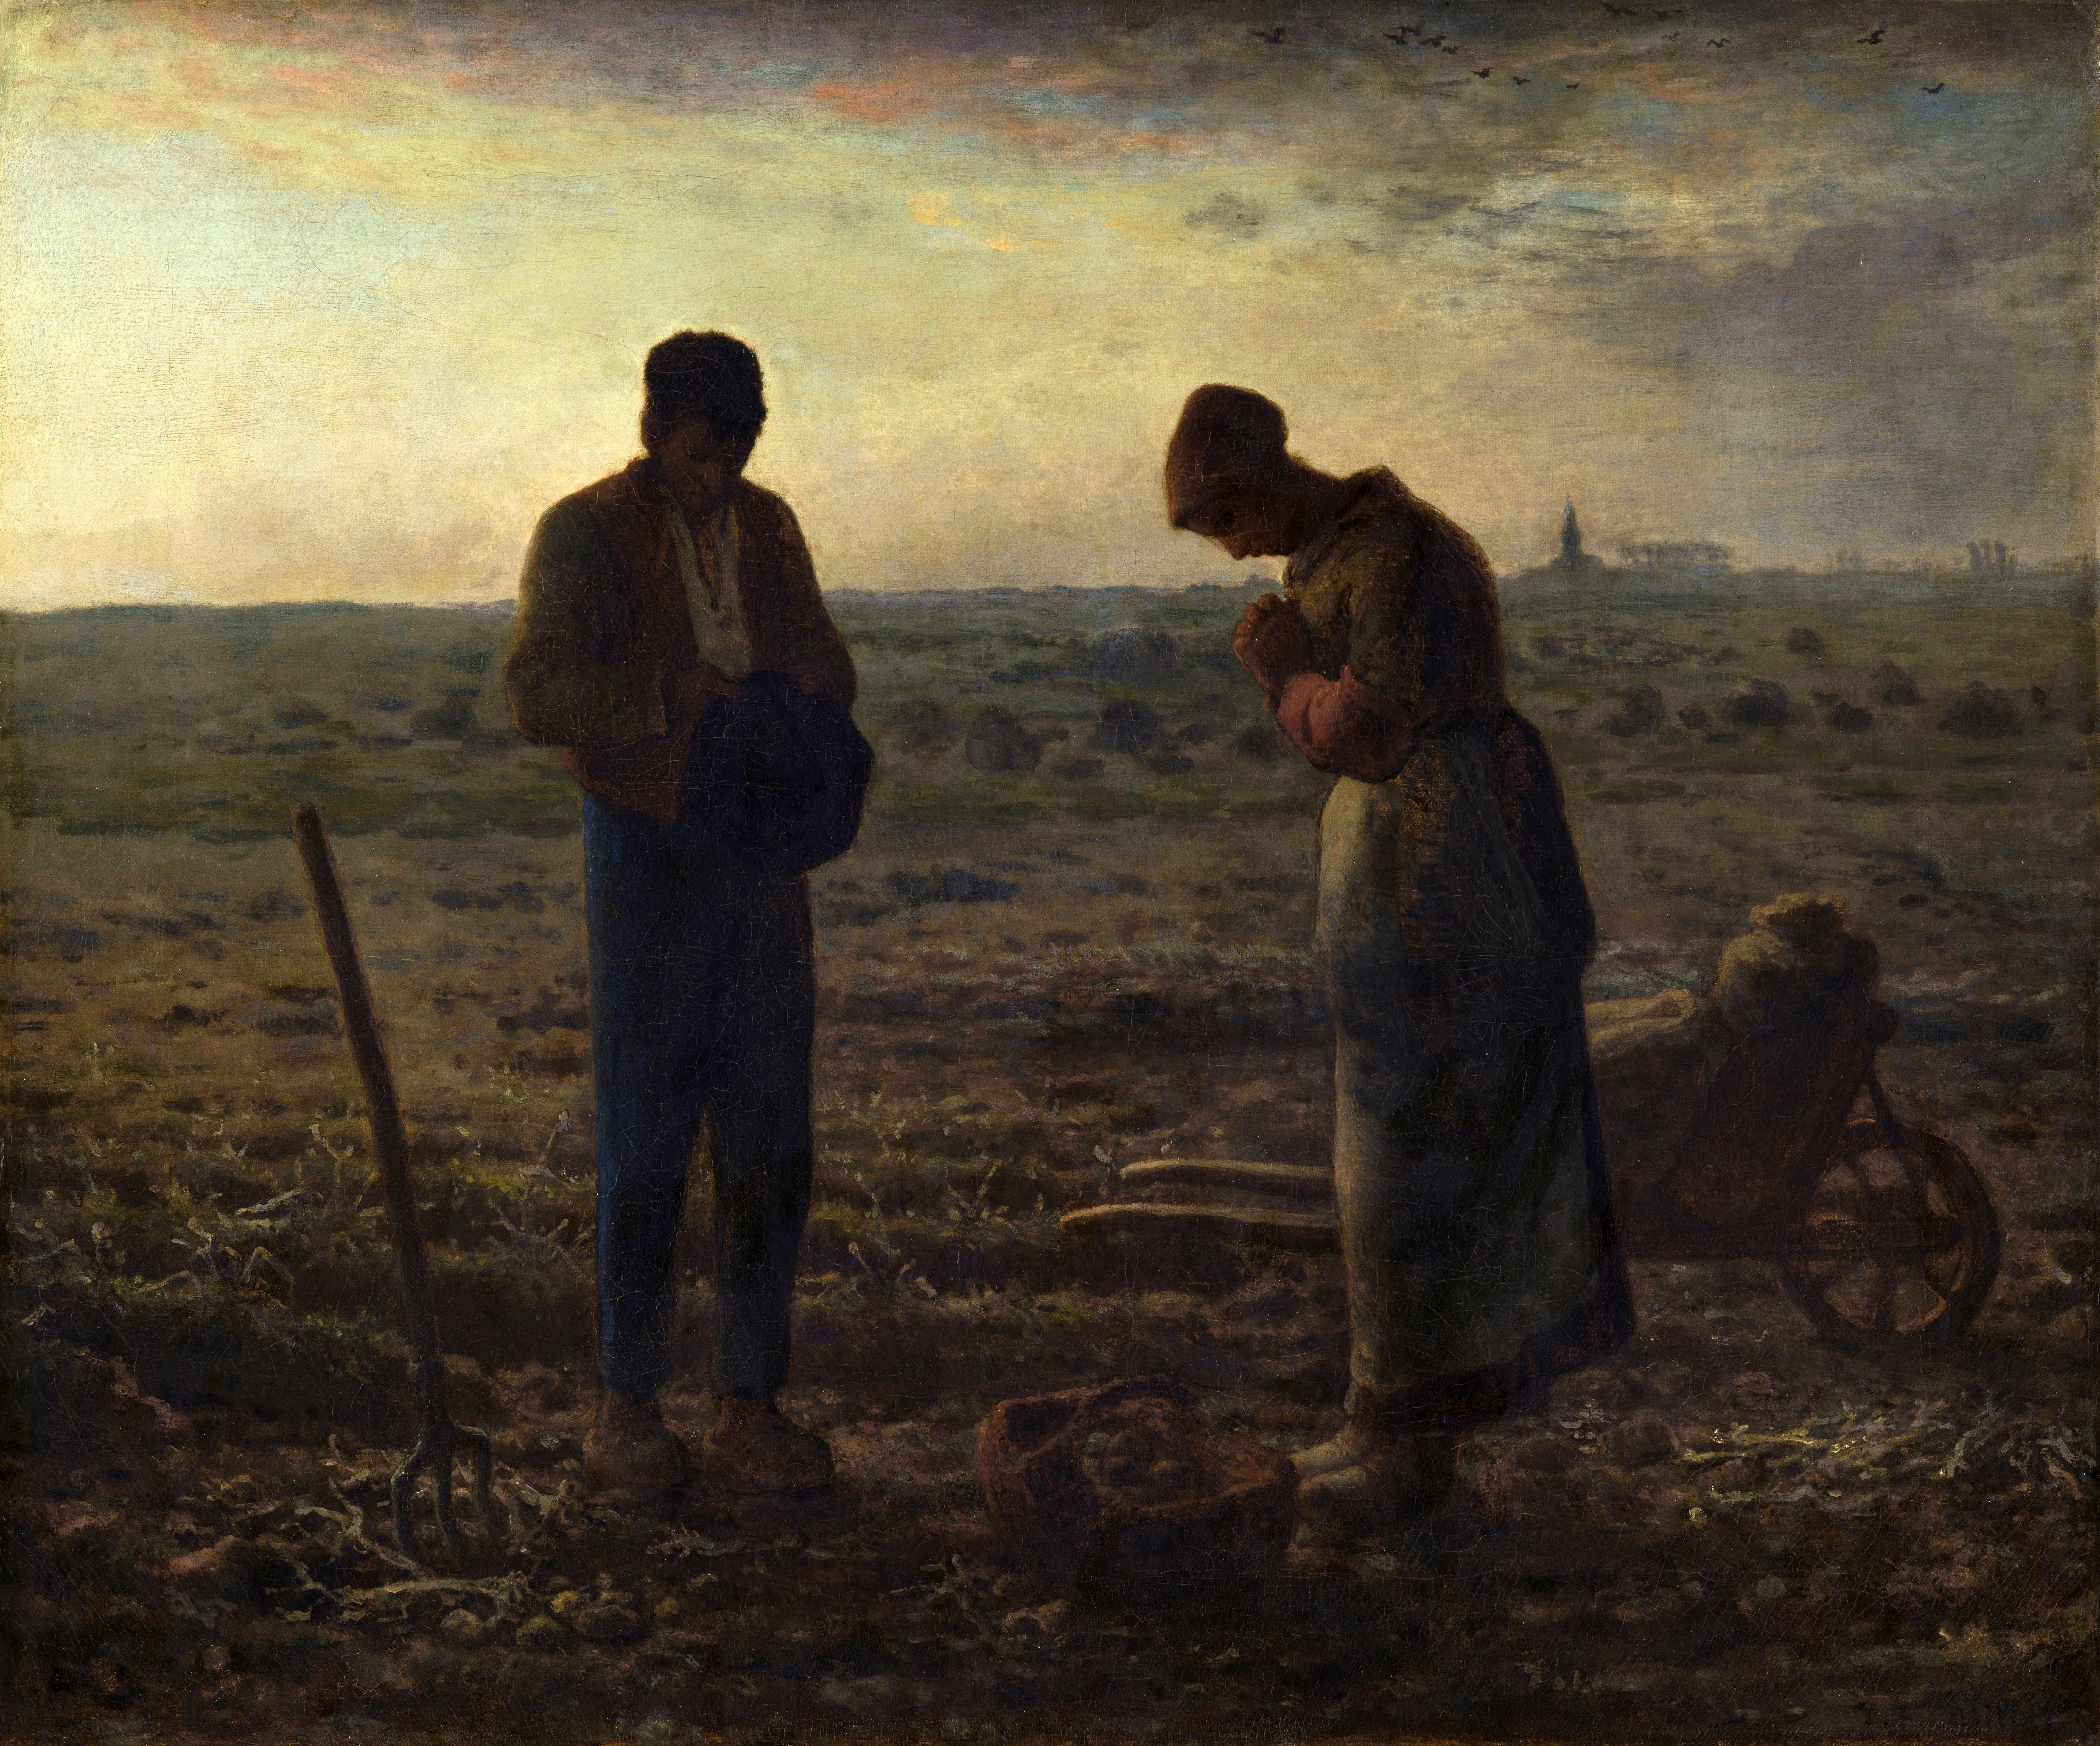 The Little Shop Peinture the angelus (painting) - wikipedia